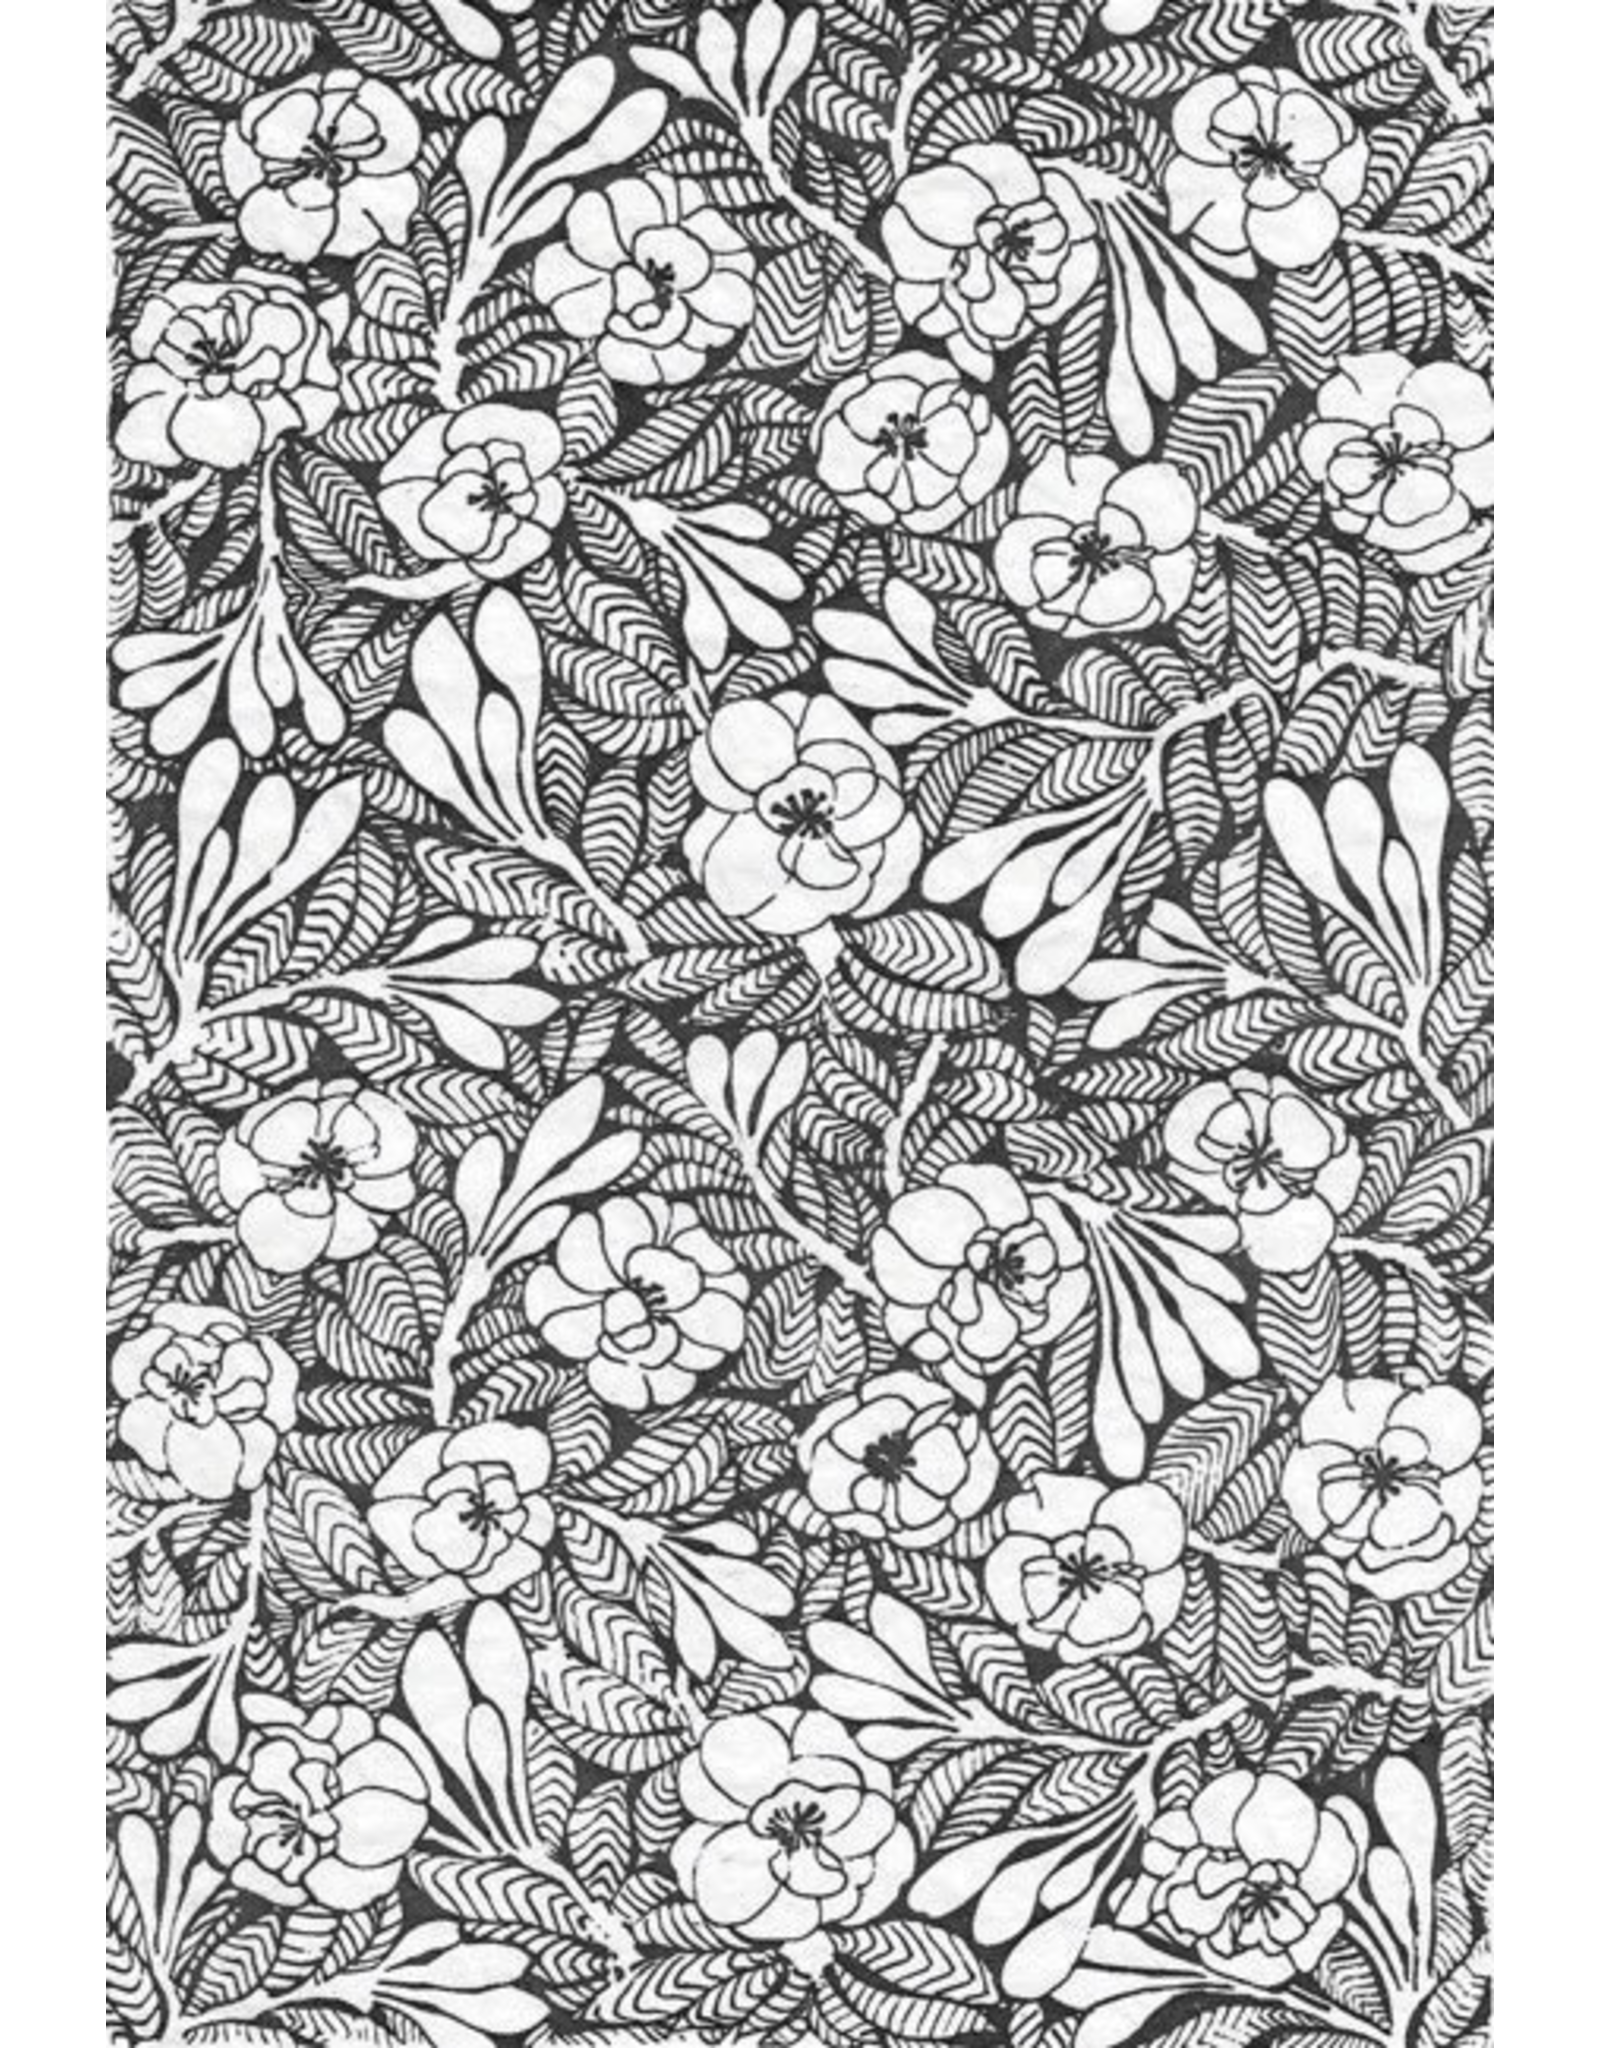 Sanbao Flower decal 04 (underglaze decal - 16cm x 22cm)